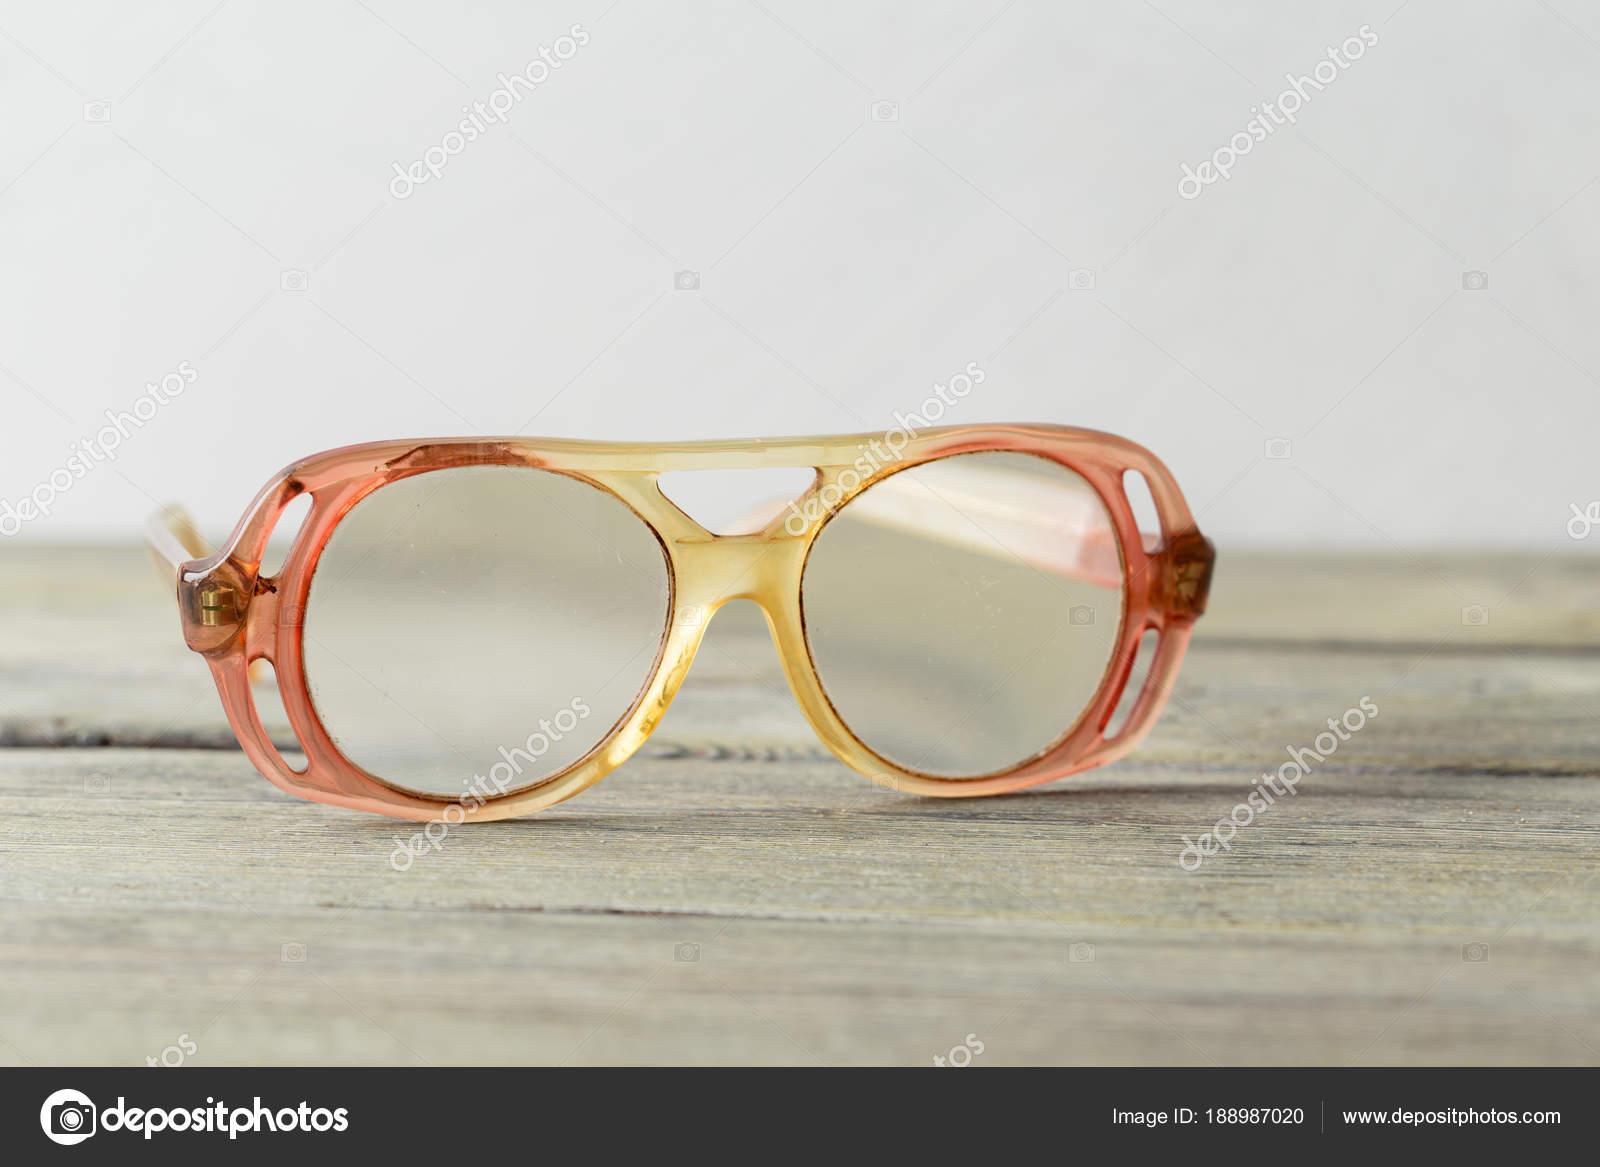 855ddf54b6 Παλιά Ντεμοντέ Γυαλιά Φόντο Ξύλινη — Φωτογραφία Αρχείου ...